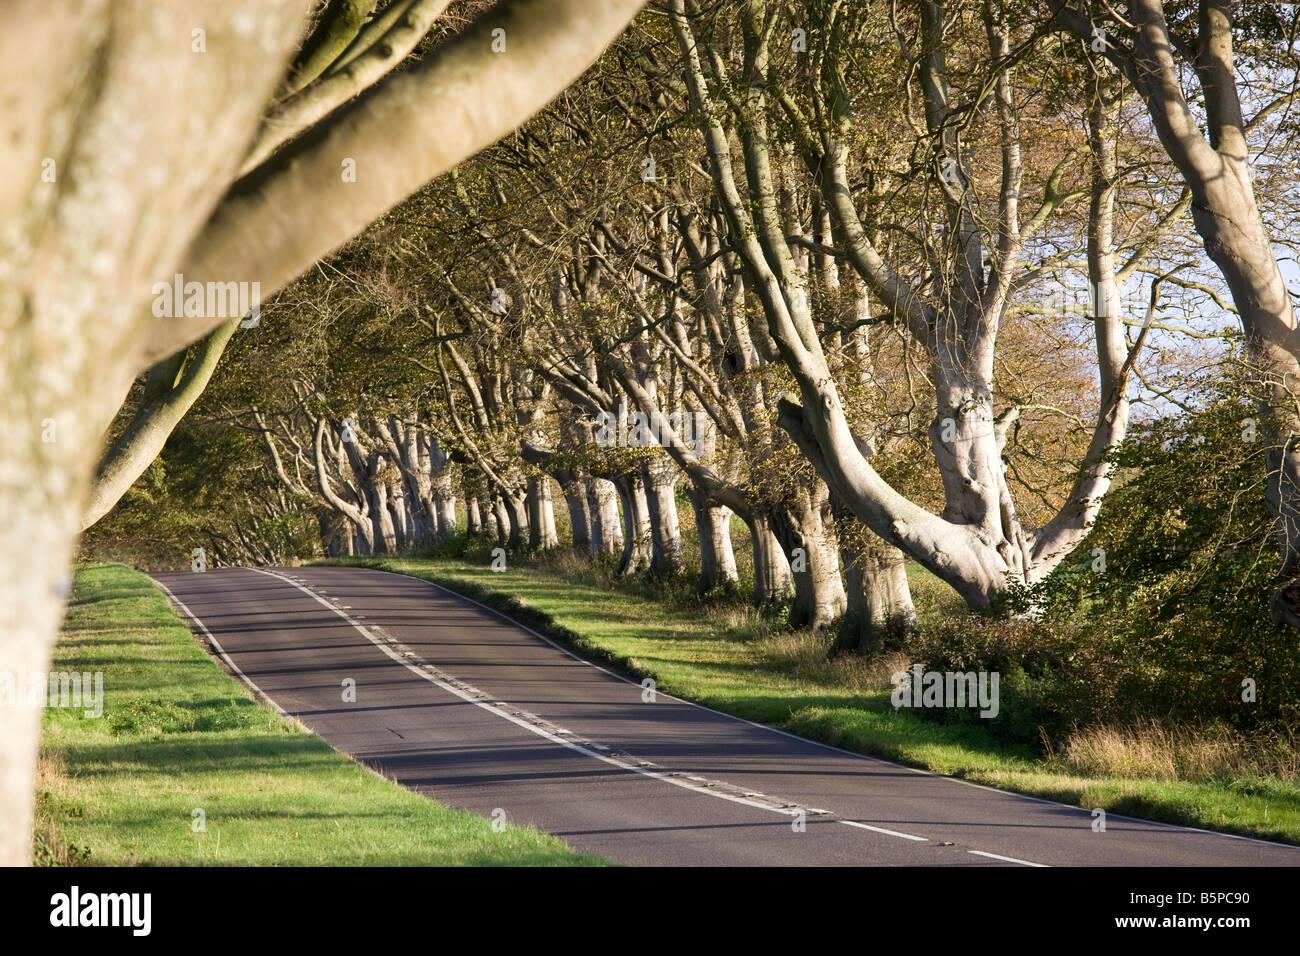 Avenue of Beech Trees at Milestone on the Wimborne to Blandford Road, Dorset, England, UK - Stock Image